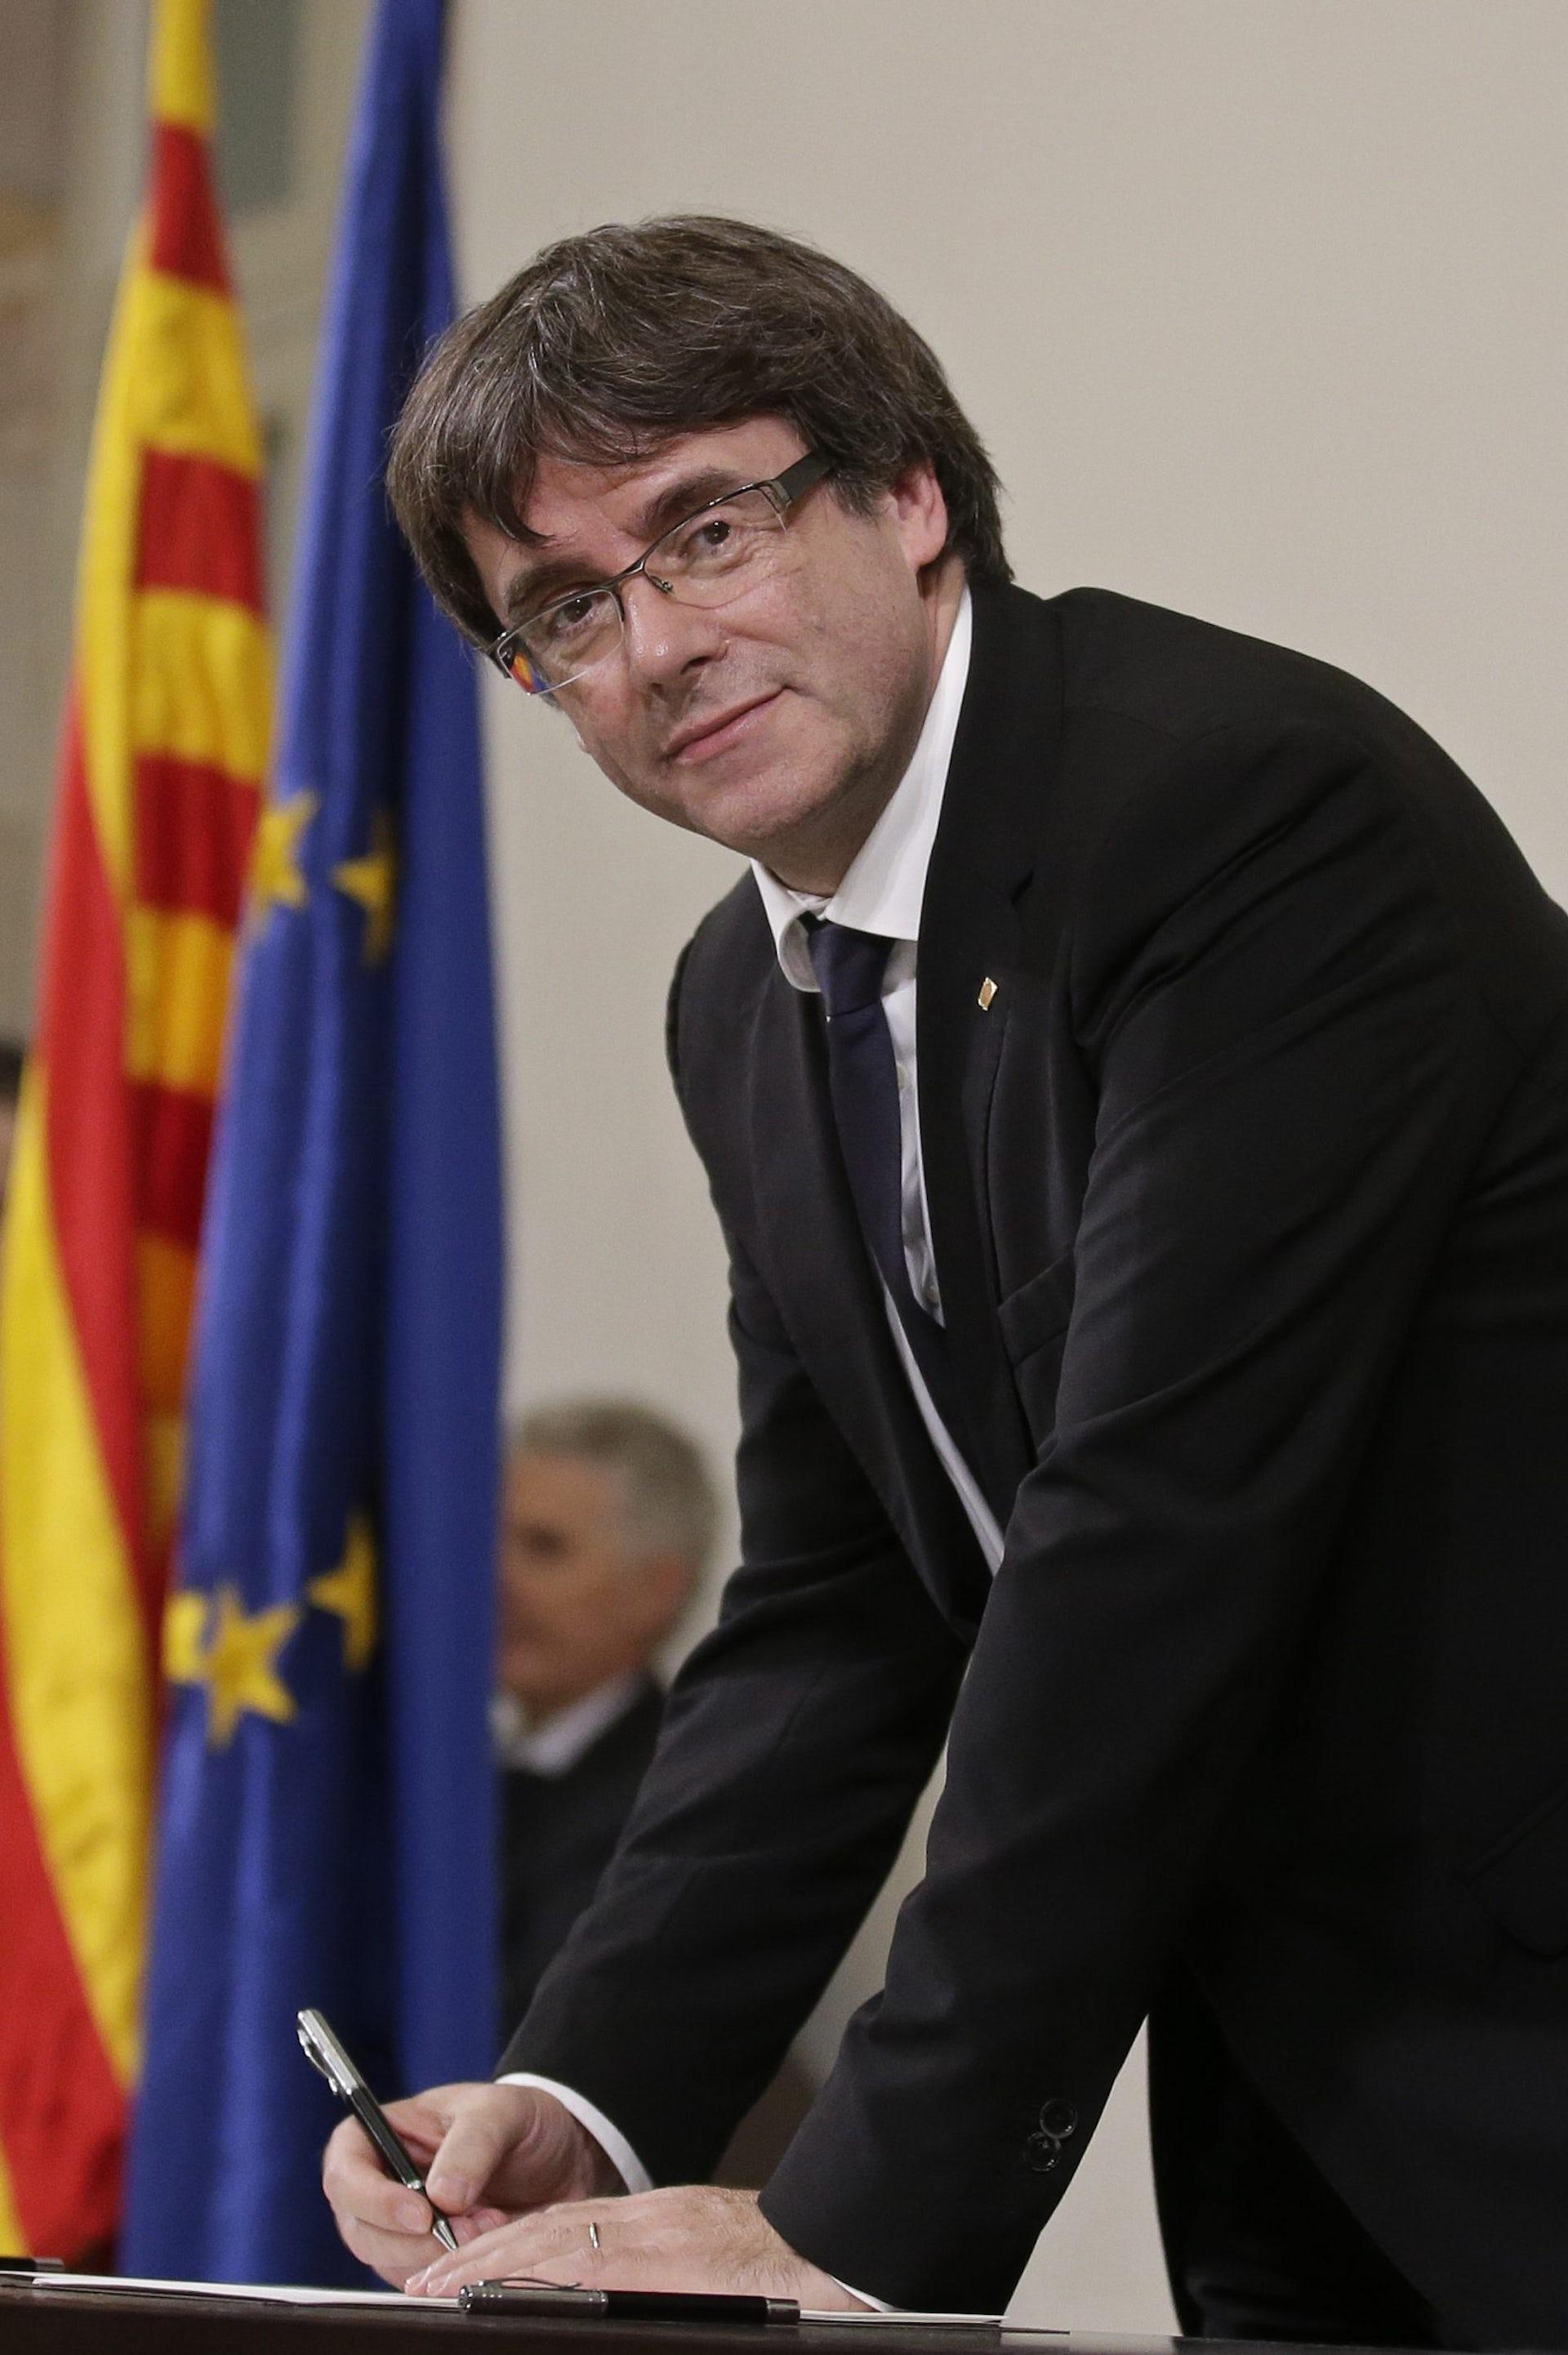 Carles Puigdemont signing an independence declaration